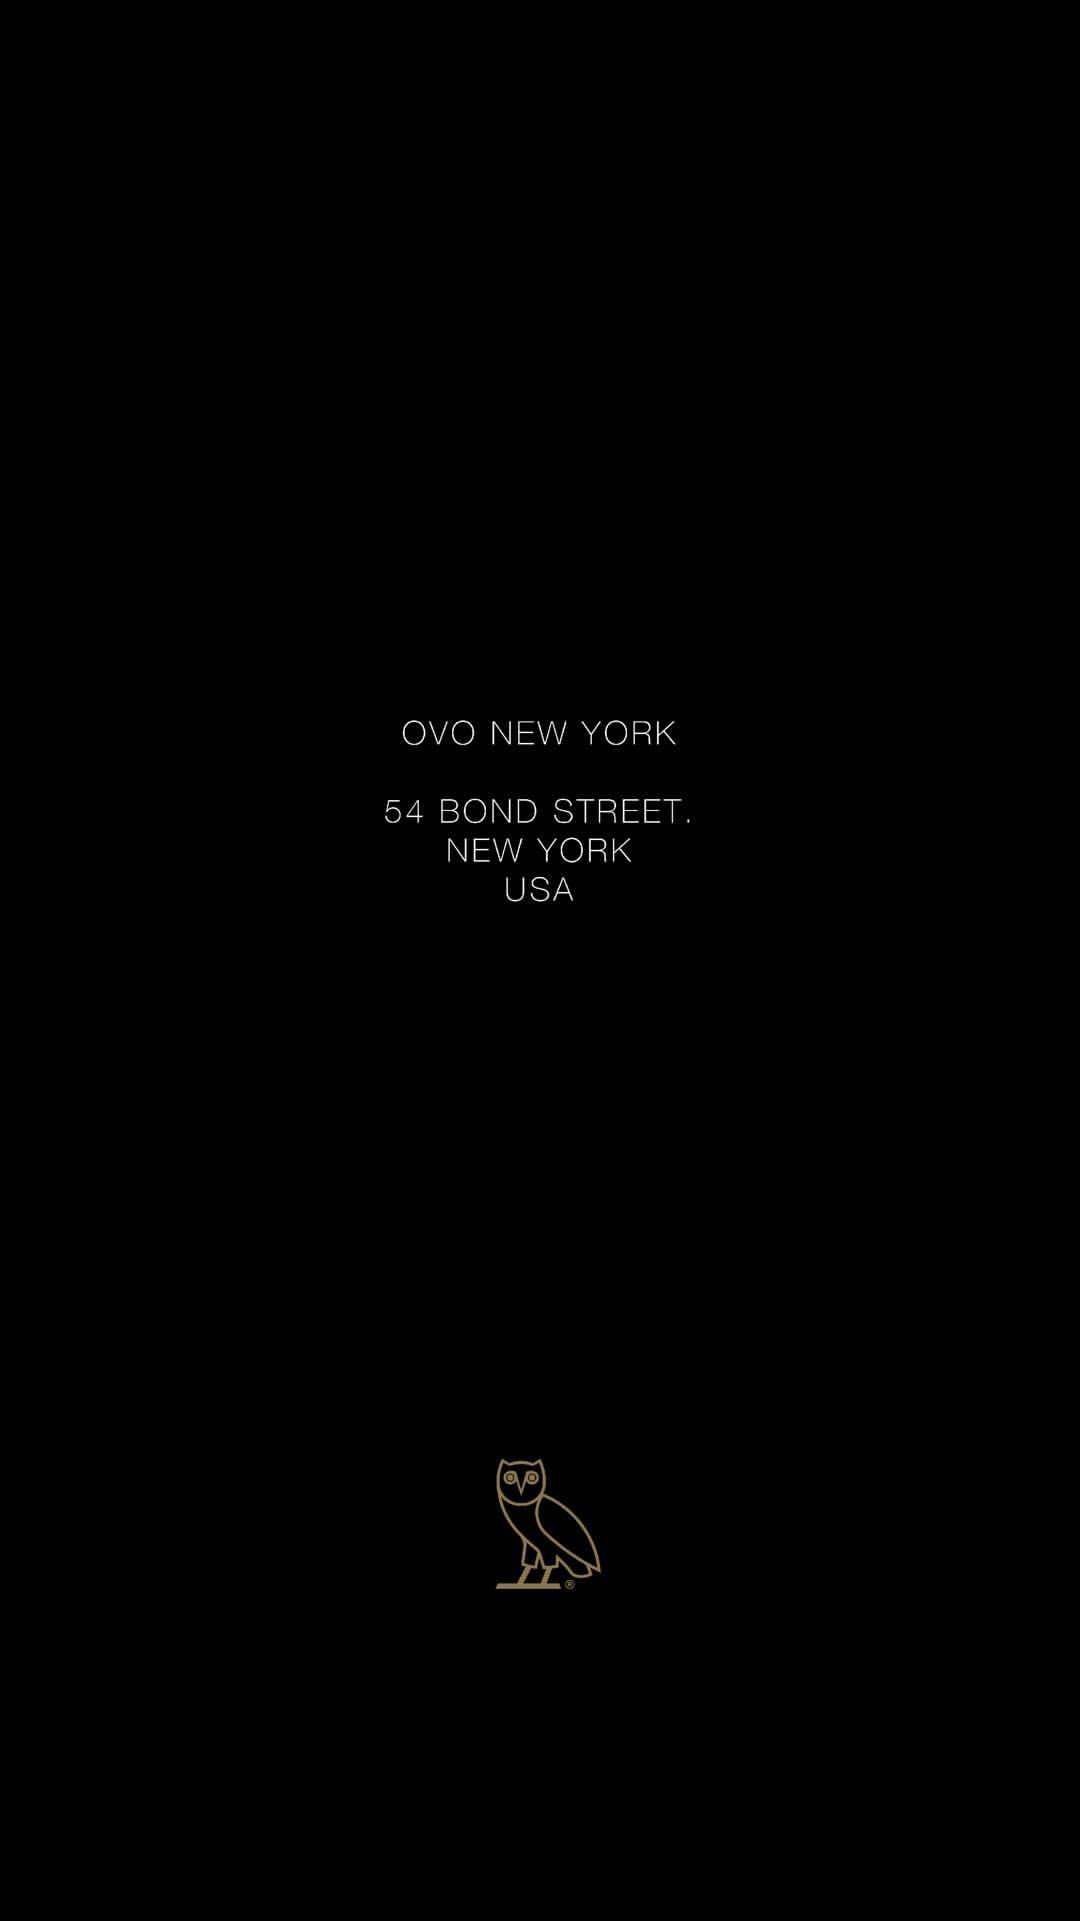 OVO New York